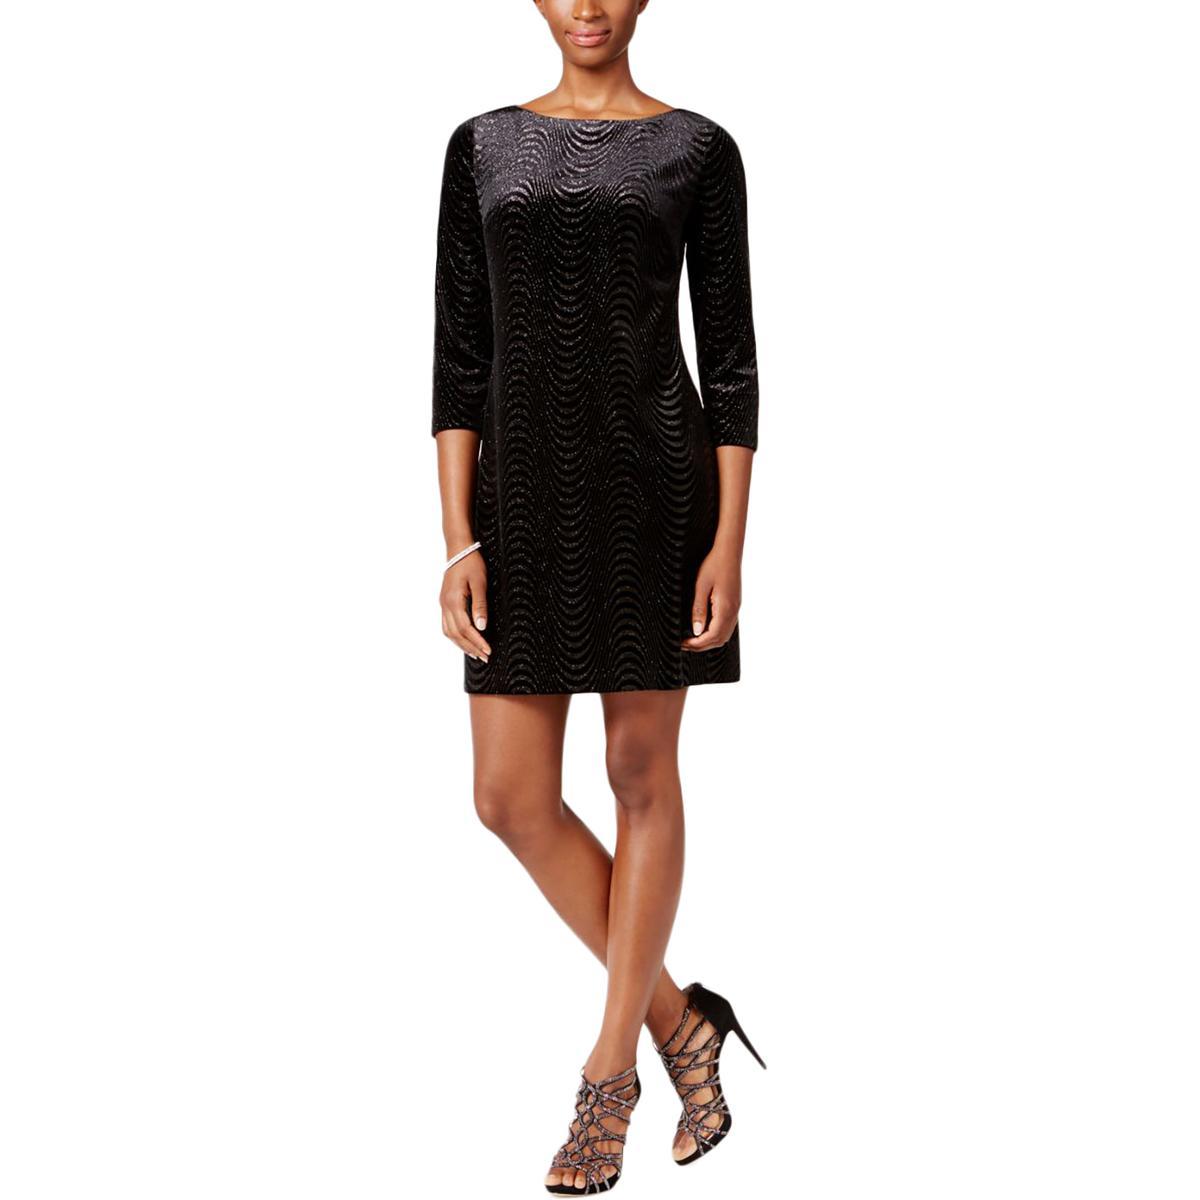 393a7c0b96c2a Jessica Howard 3626 Size 8 Womens Black Metallic Shift Dress Above ...